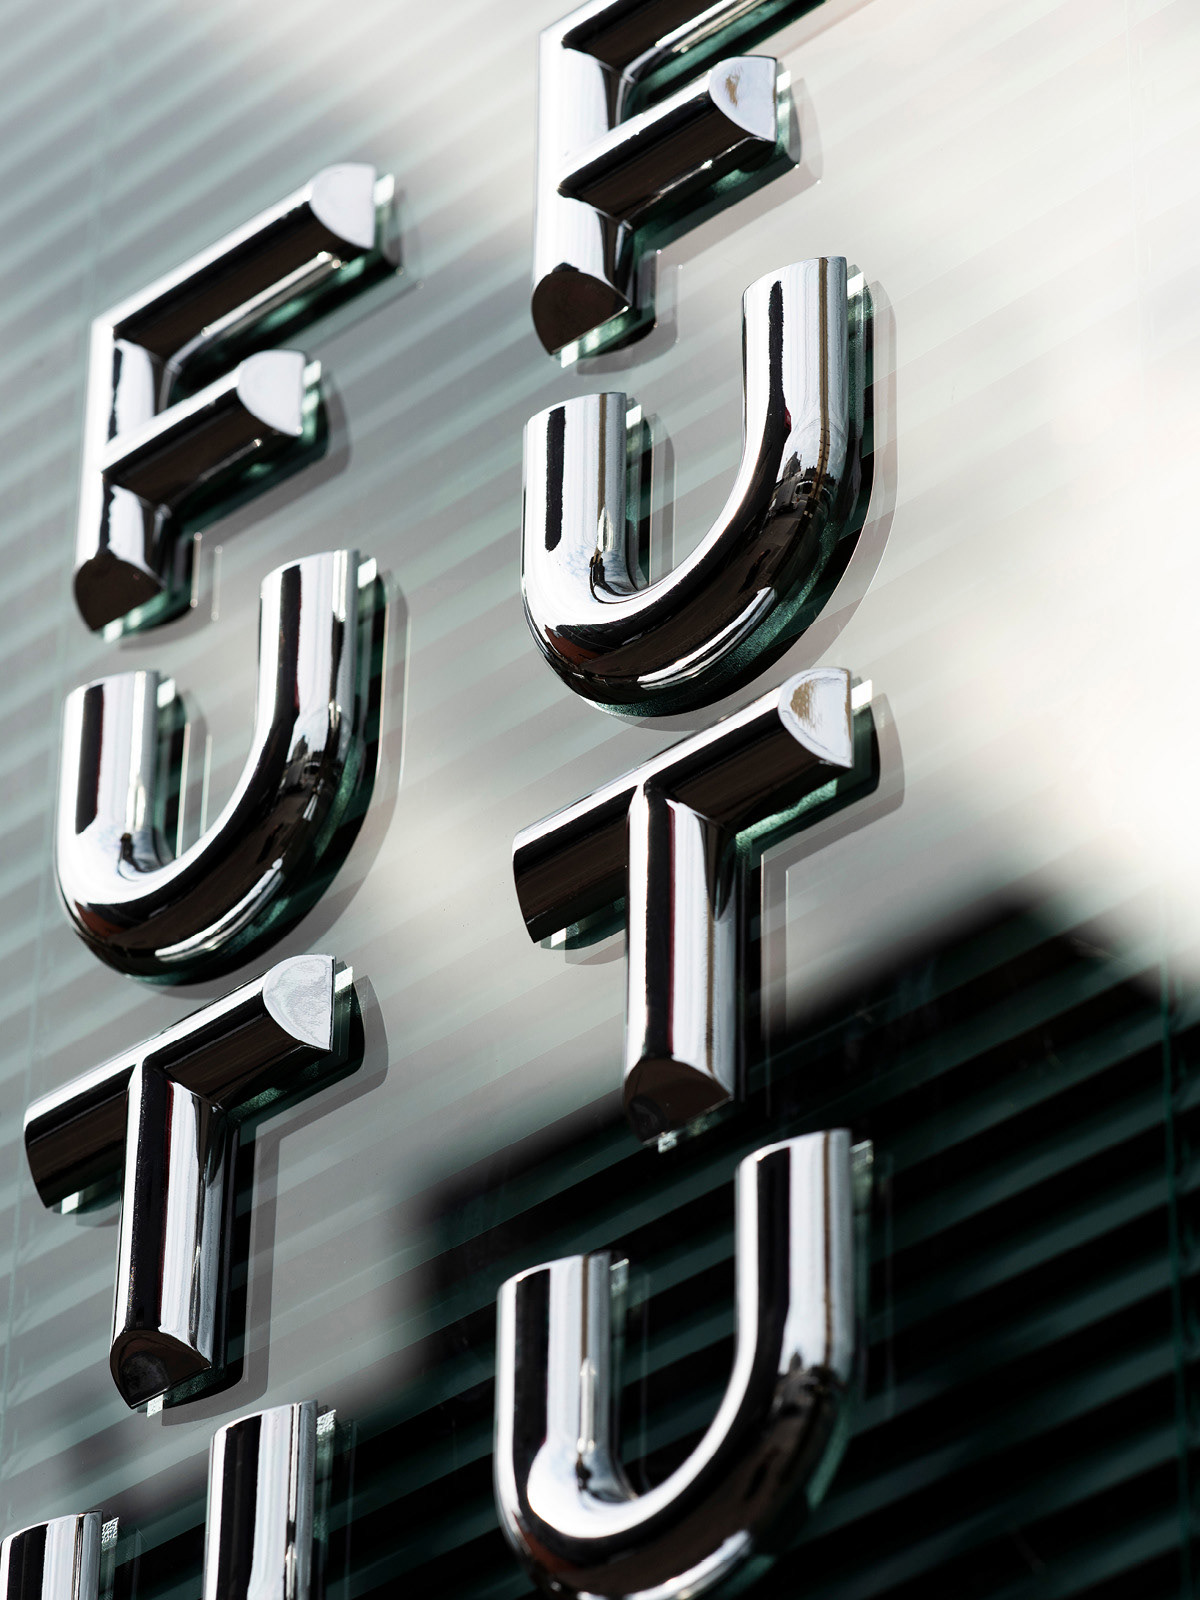 Future Future餐厅品牌形象设计